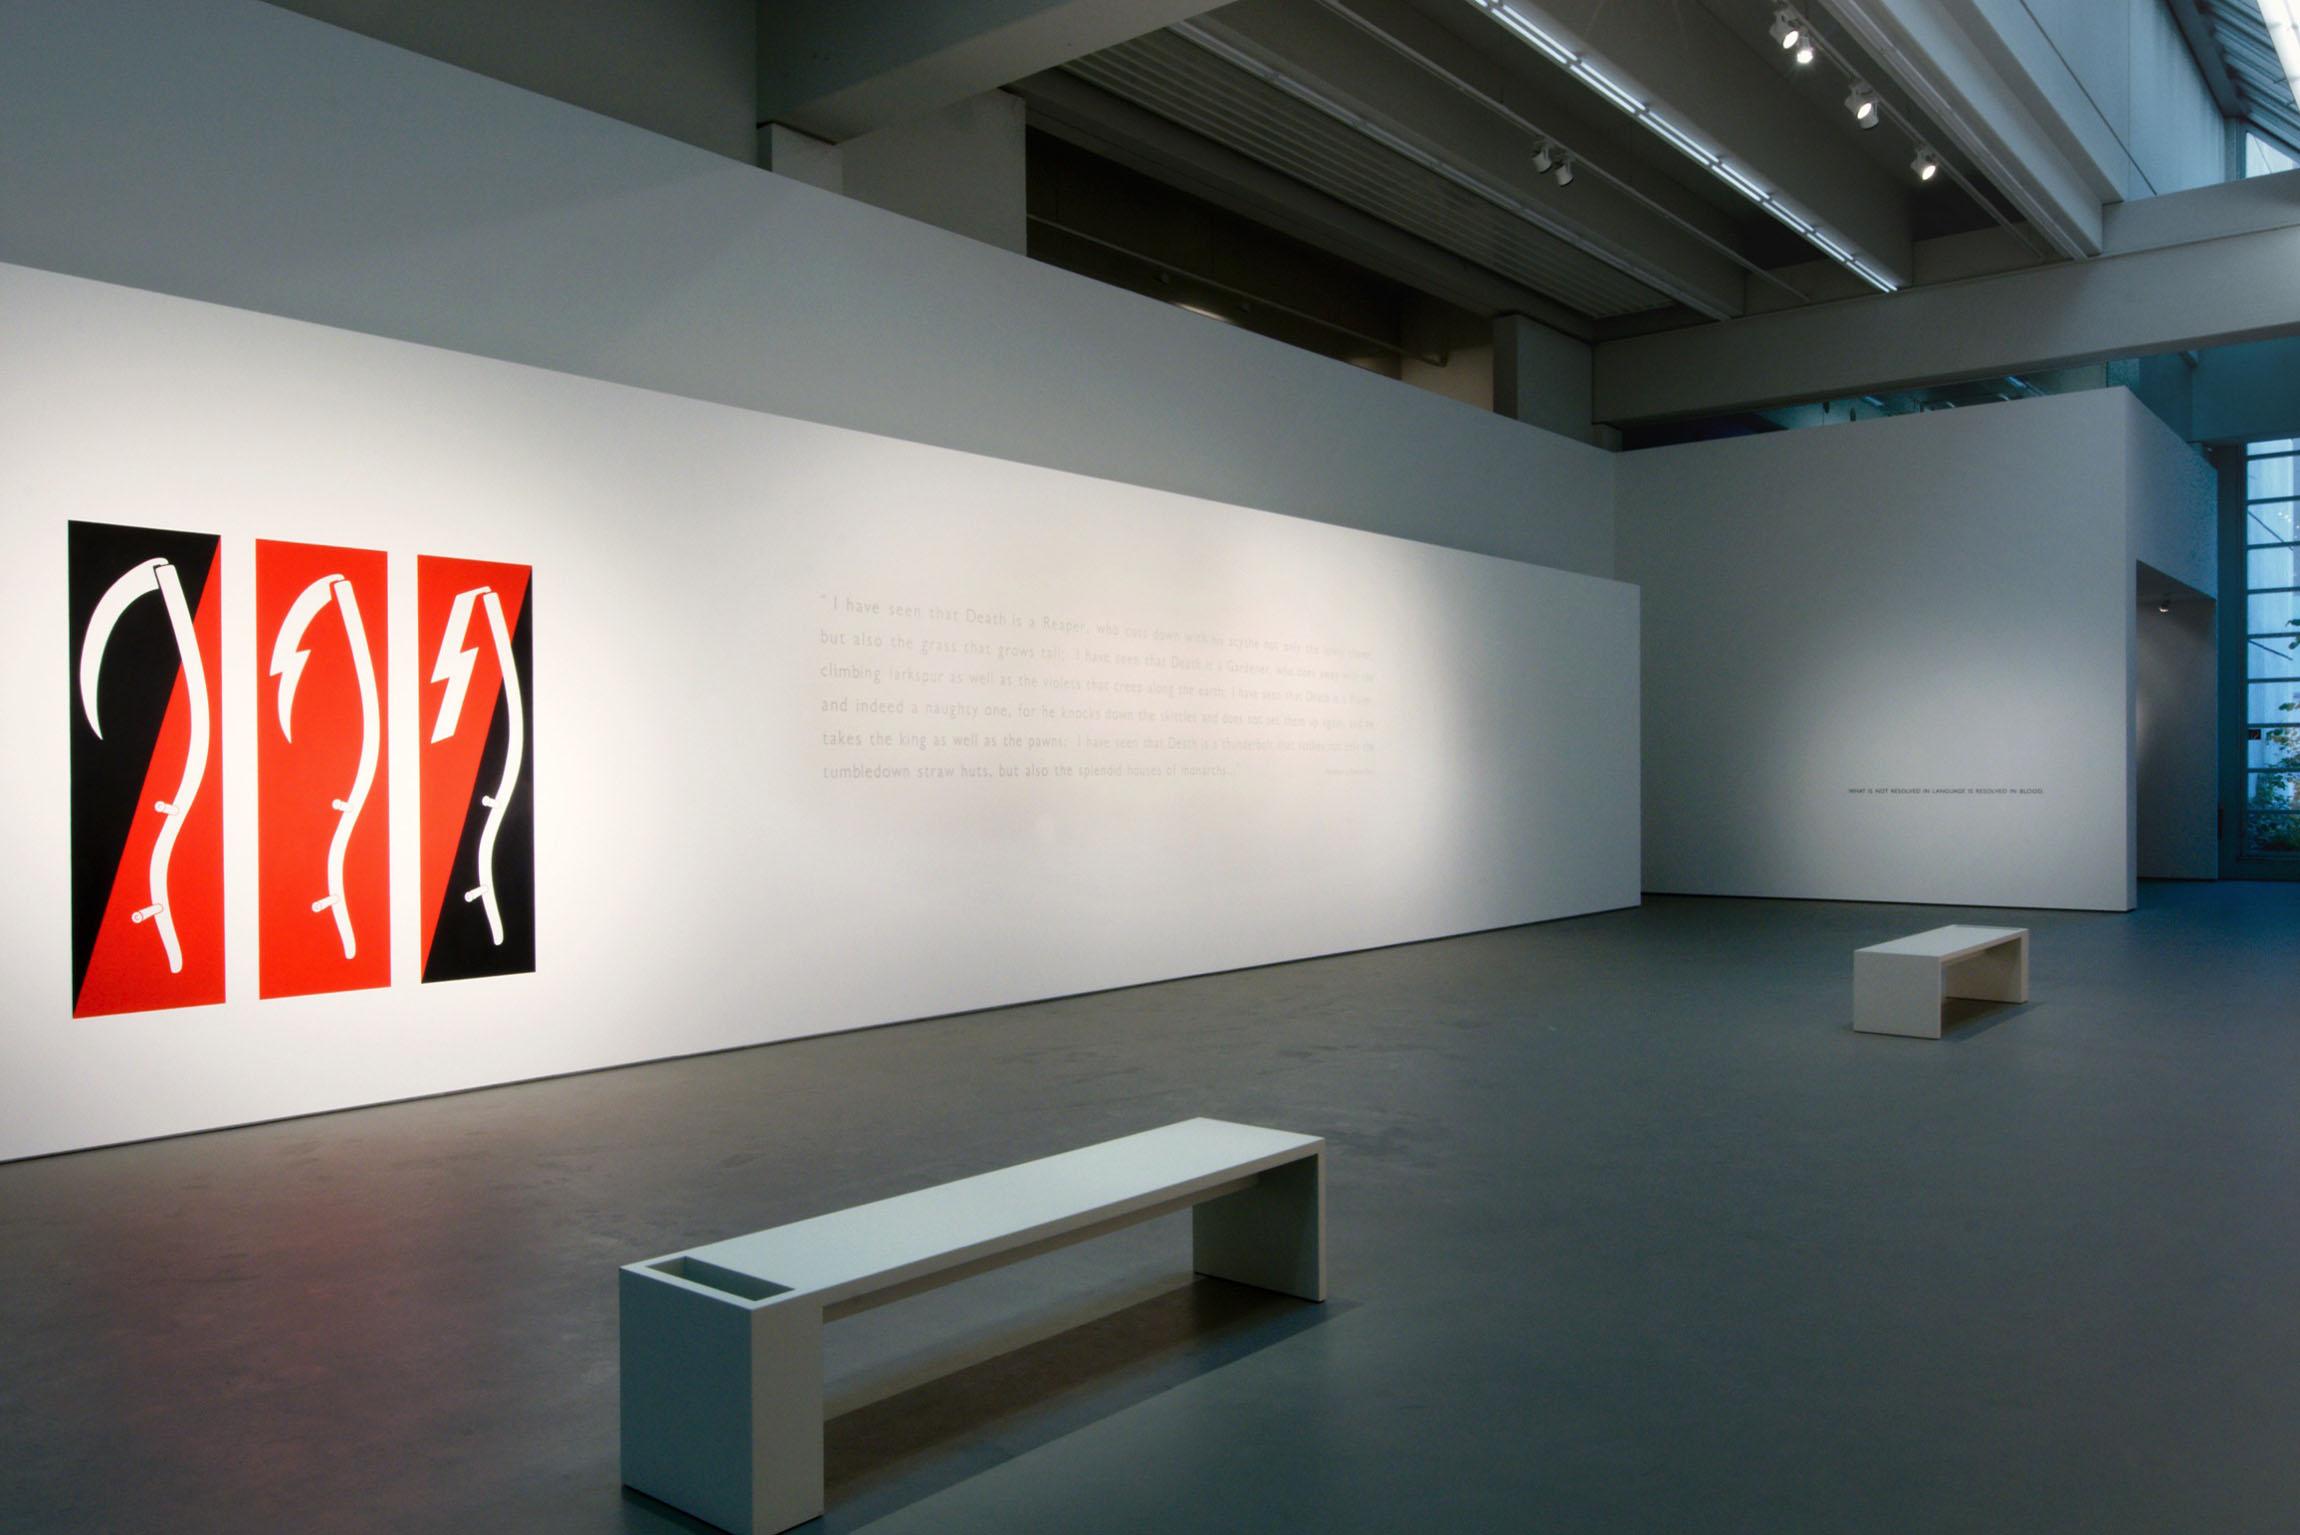 2012 Ian Hamilton Finlay Inter artes et naturam